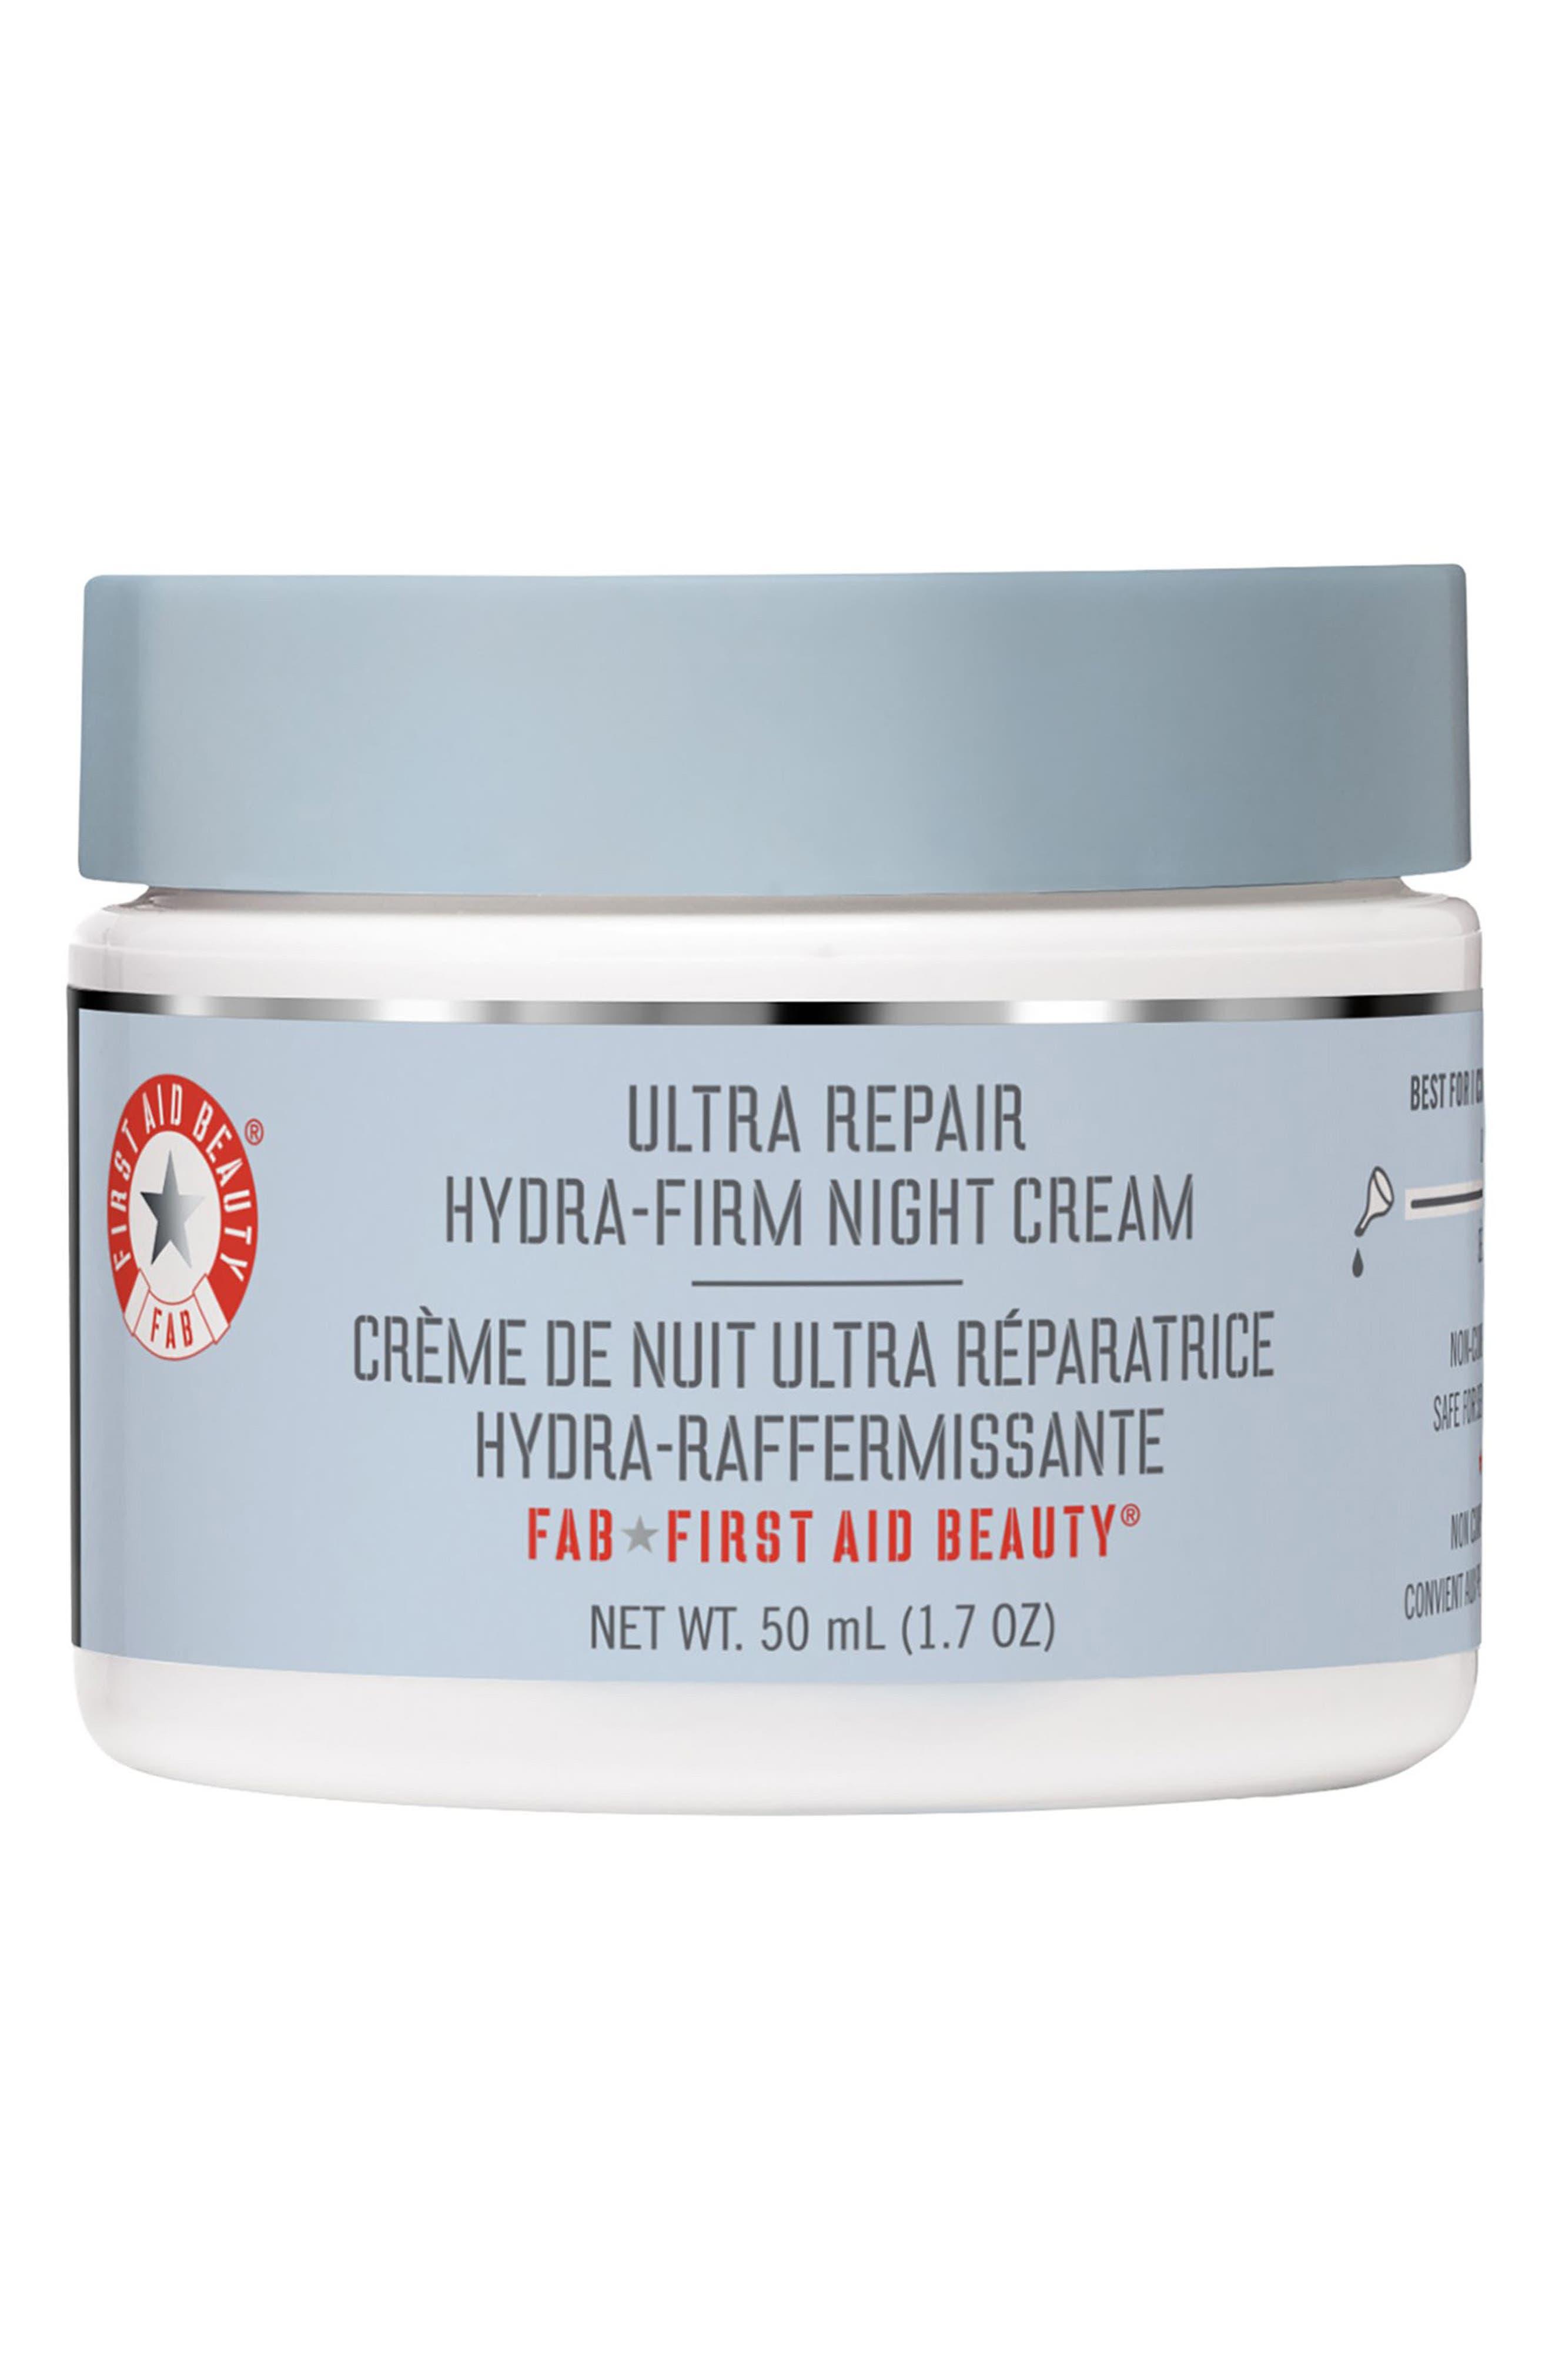 Ultra Repair Hydra-Firm Night Cream